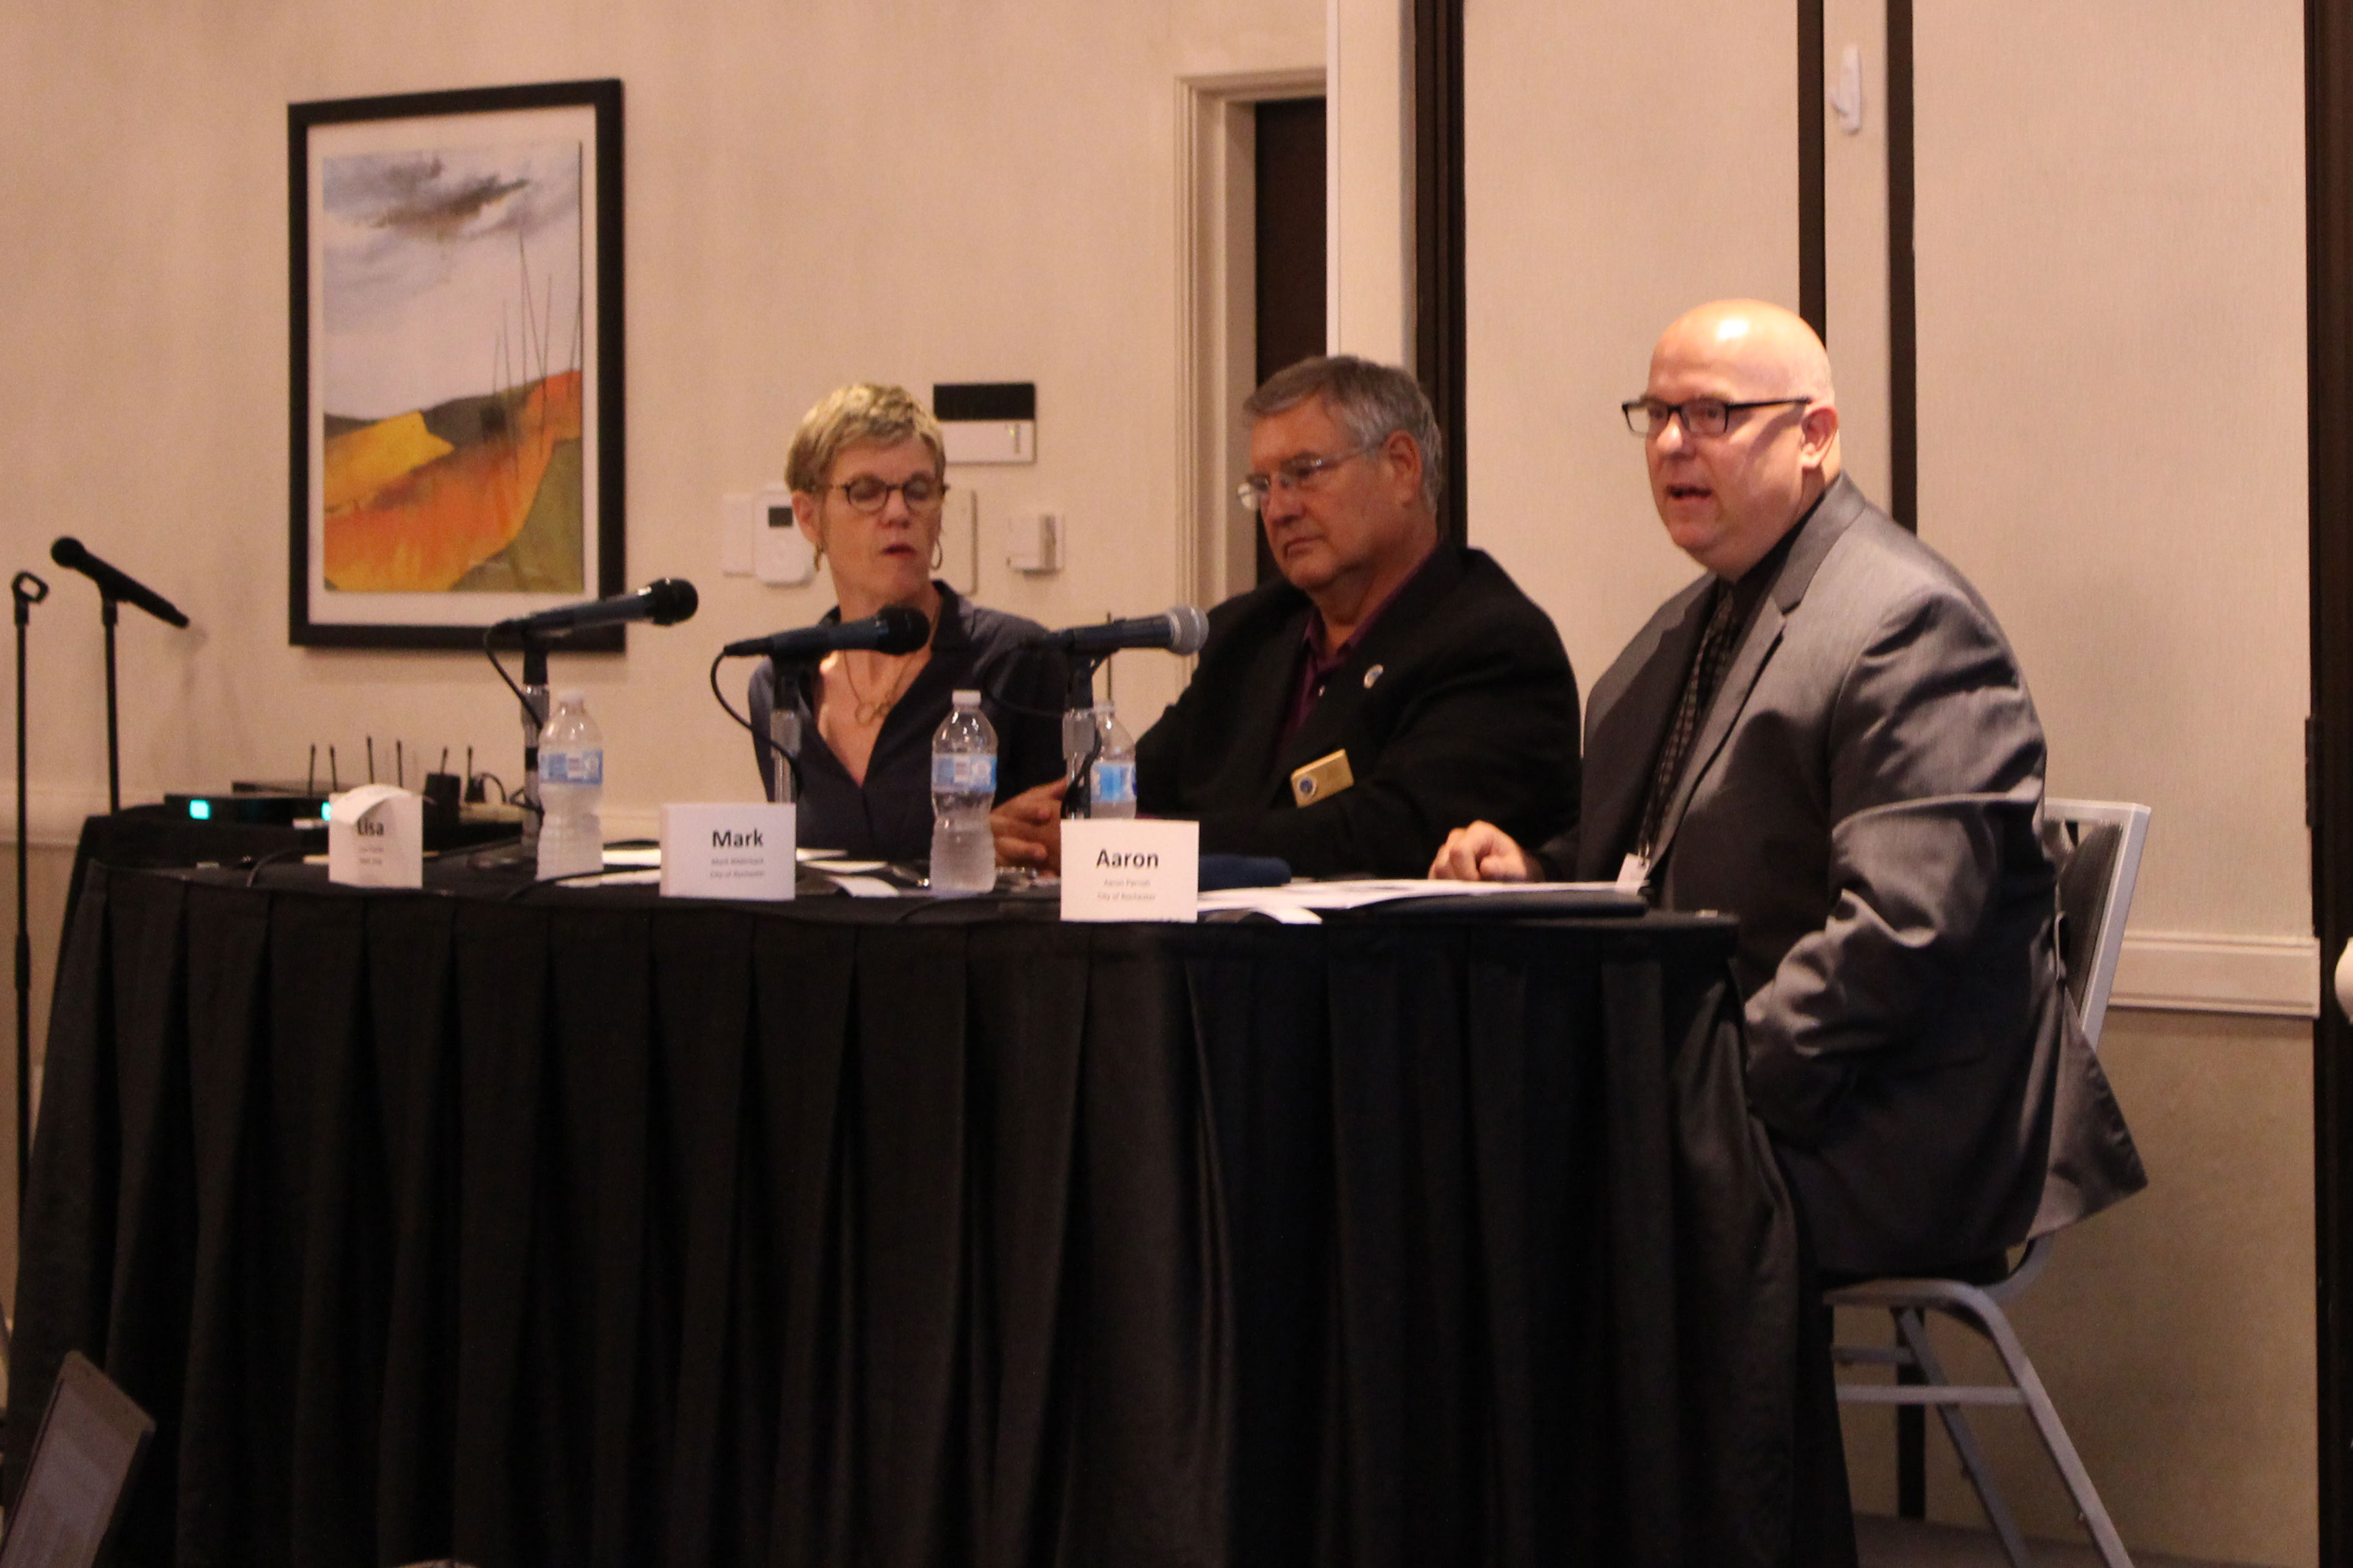 From left: DMC Executive Director Lisa Clarke, City Councilmember Mark Bilderback, and Assistant City Administrator Aaron Parrish